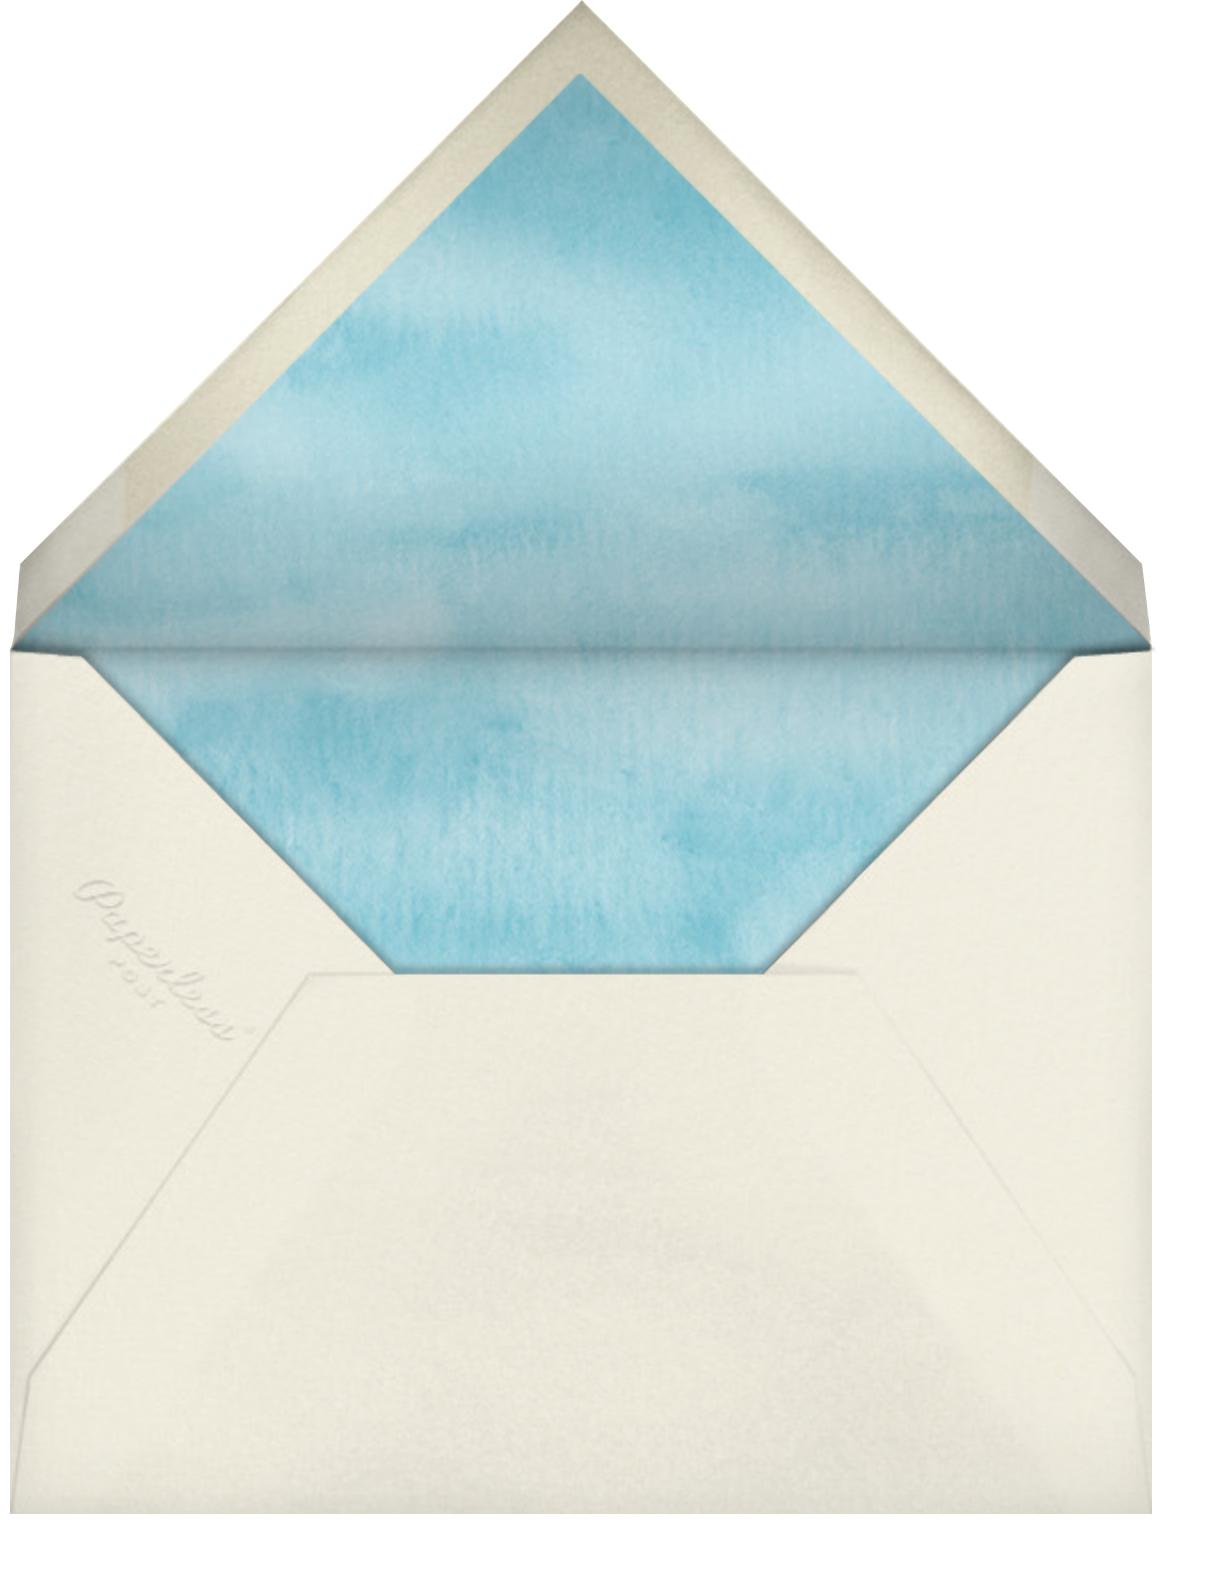 Paint Samples - Felix Doolittle - Moving - envelope back